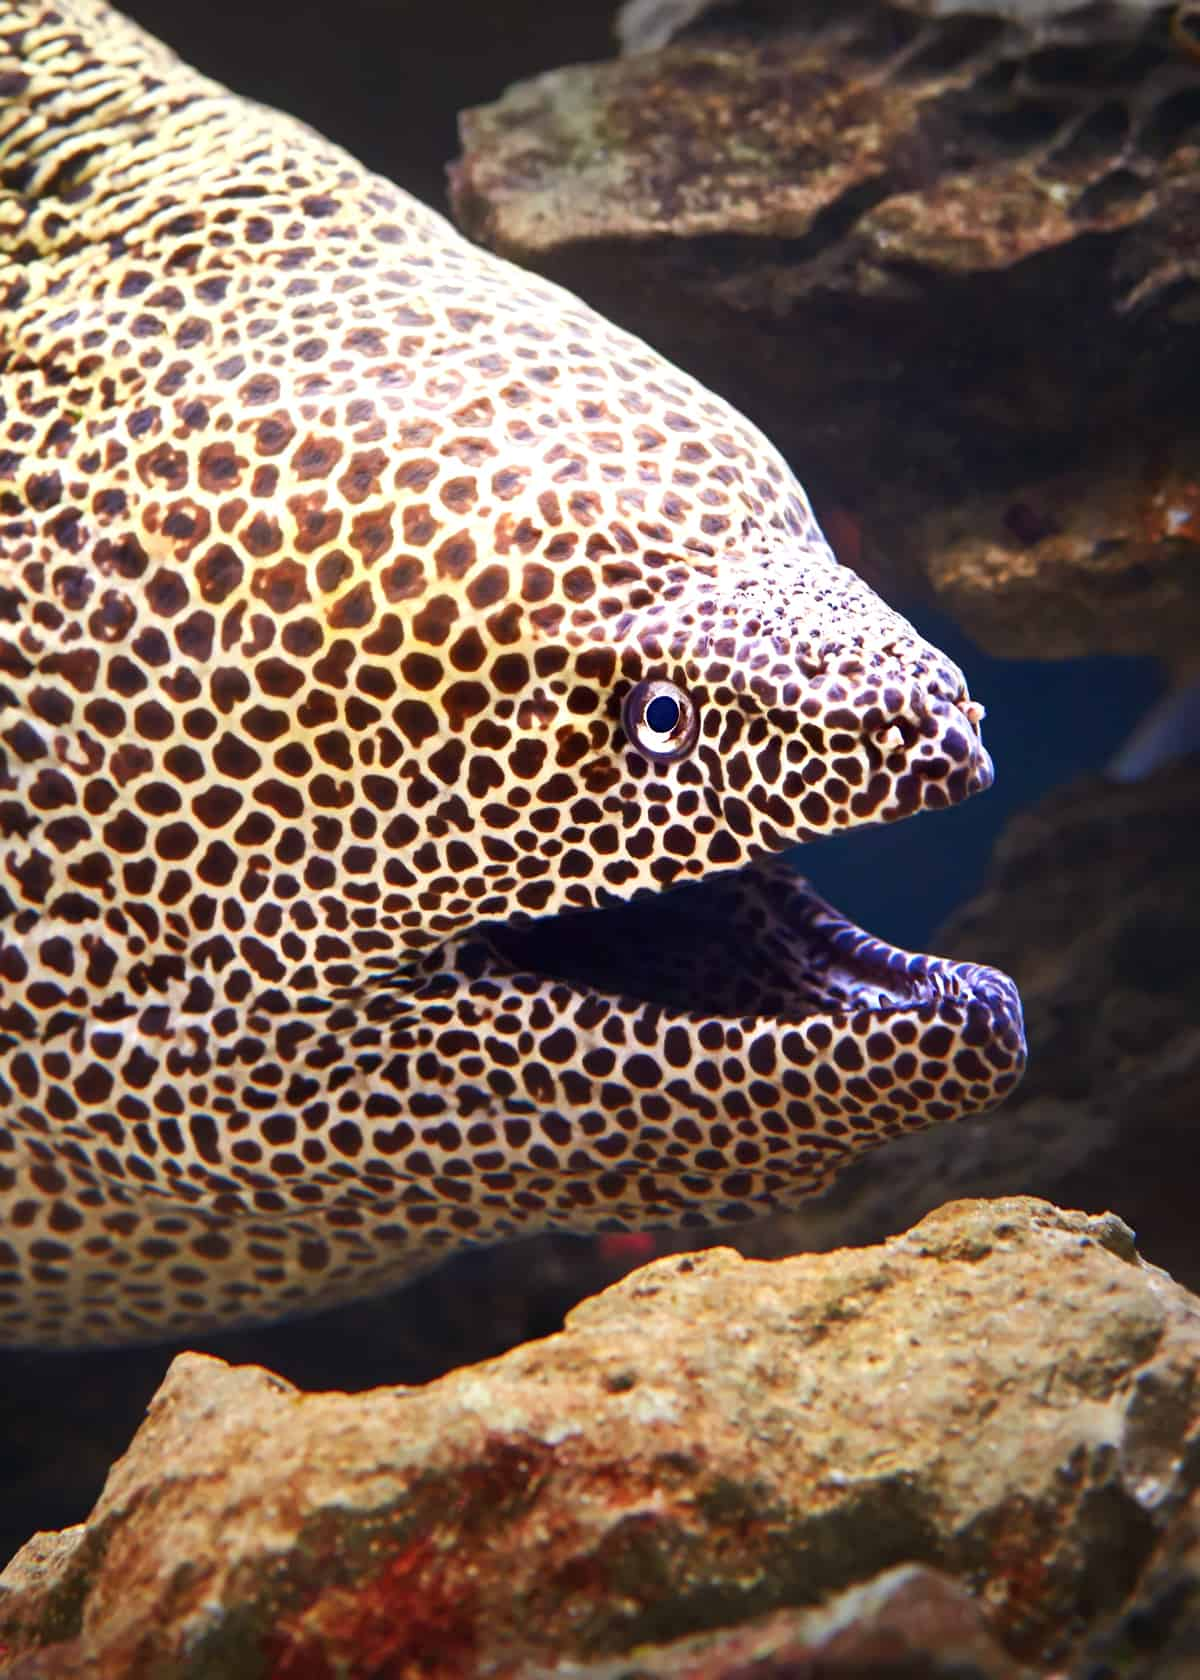 Moray eel facts